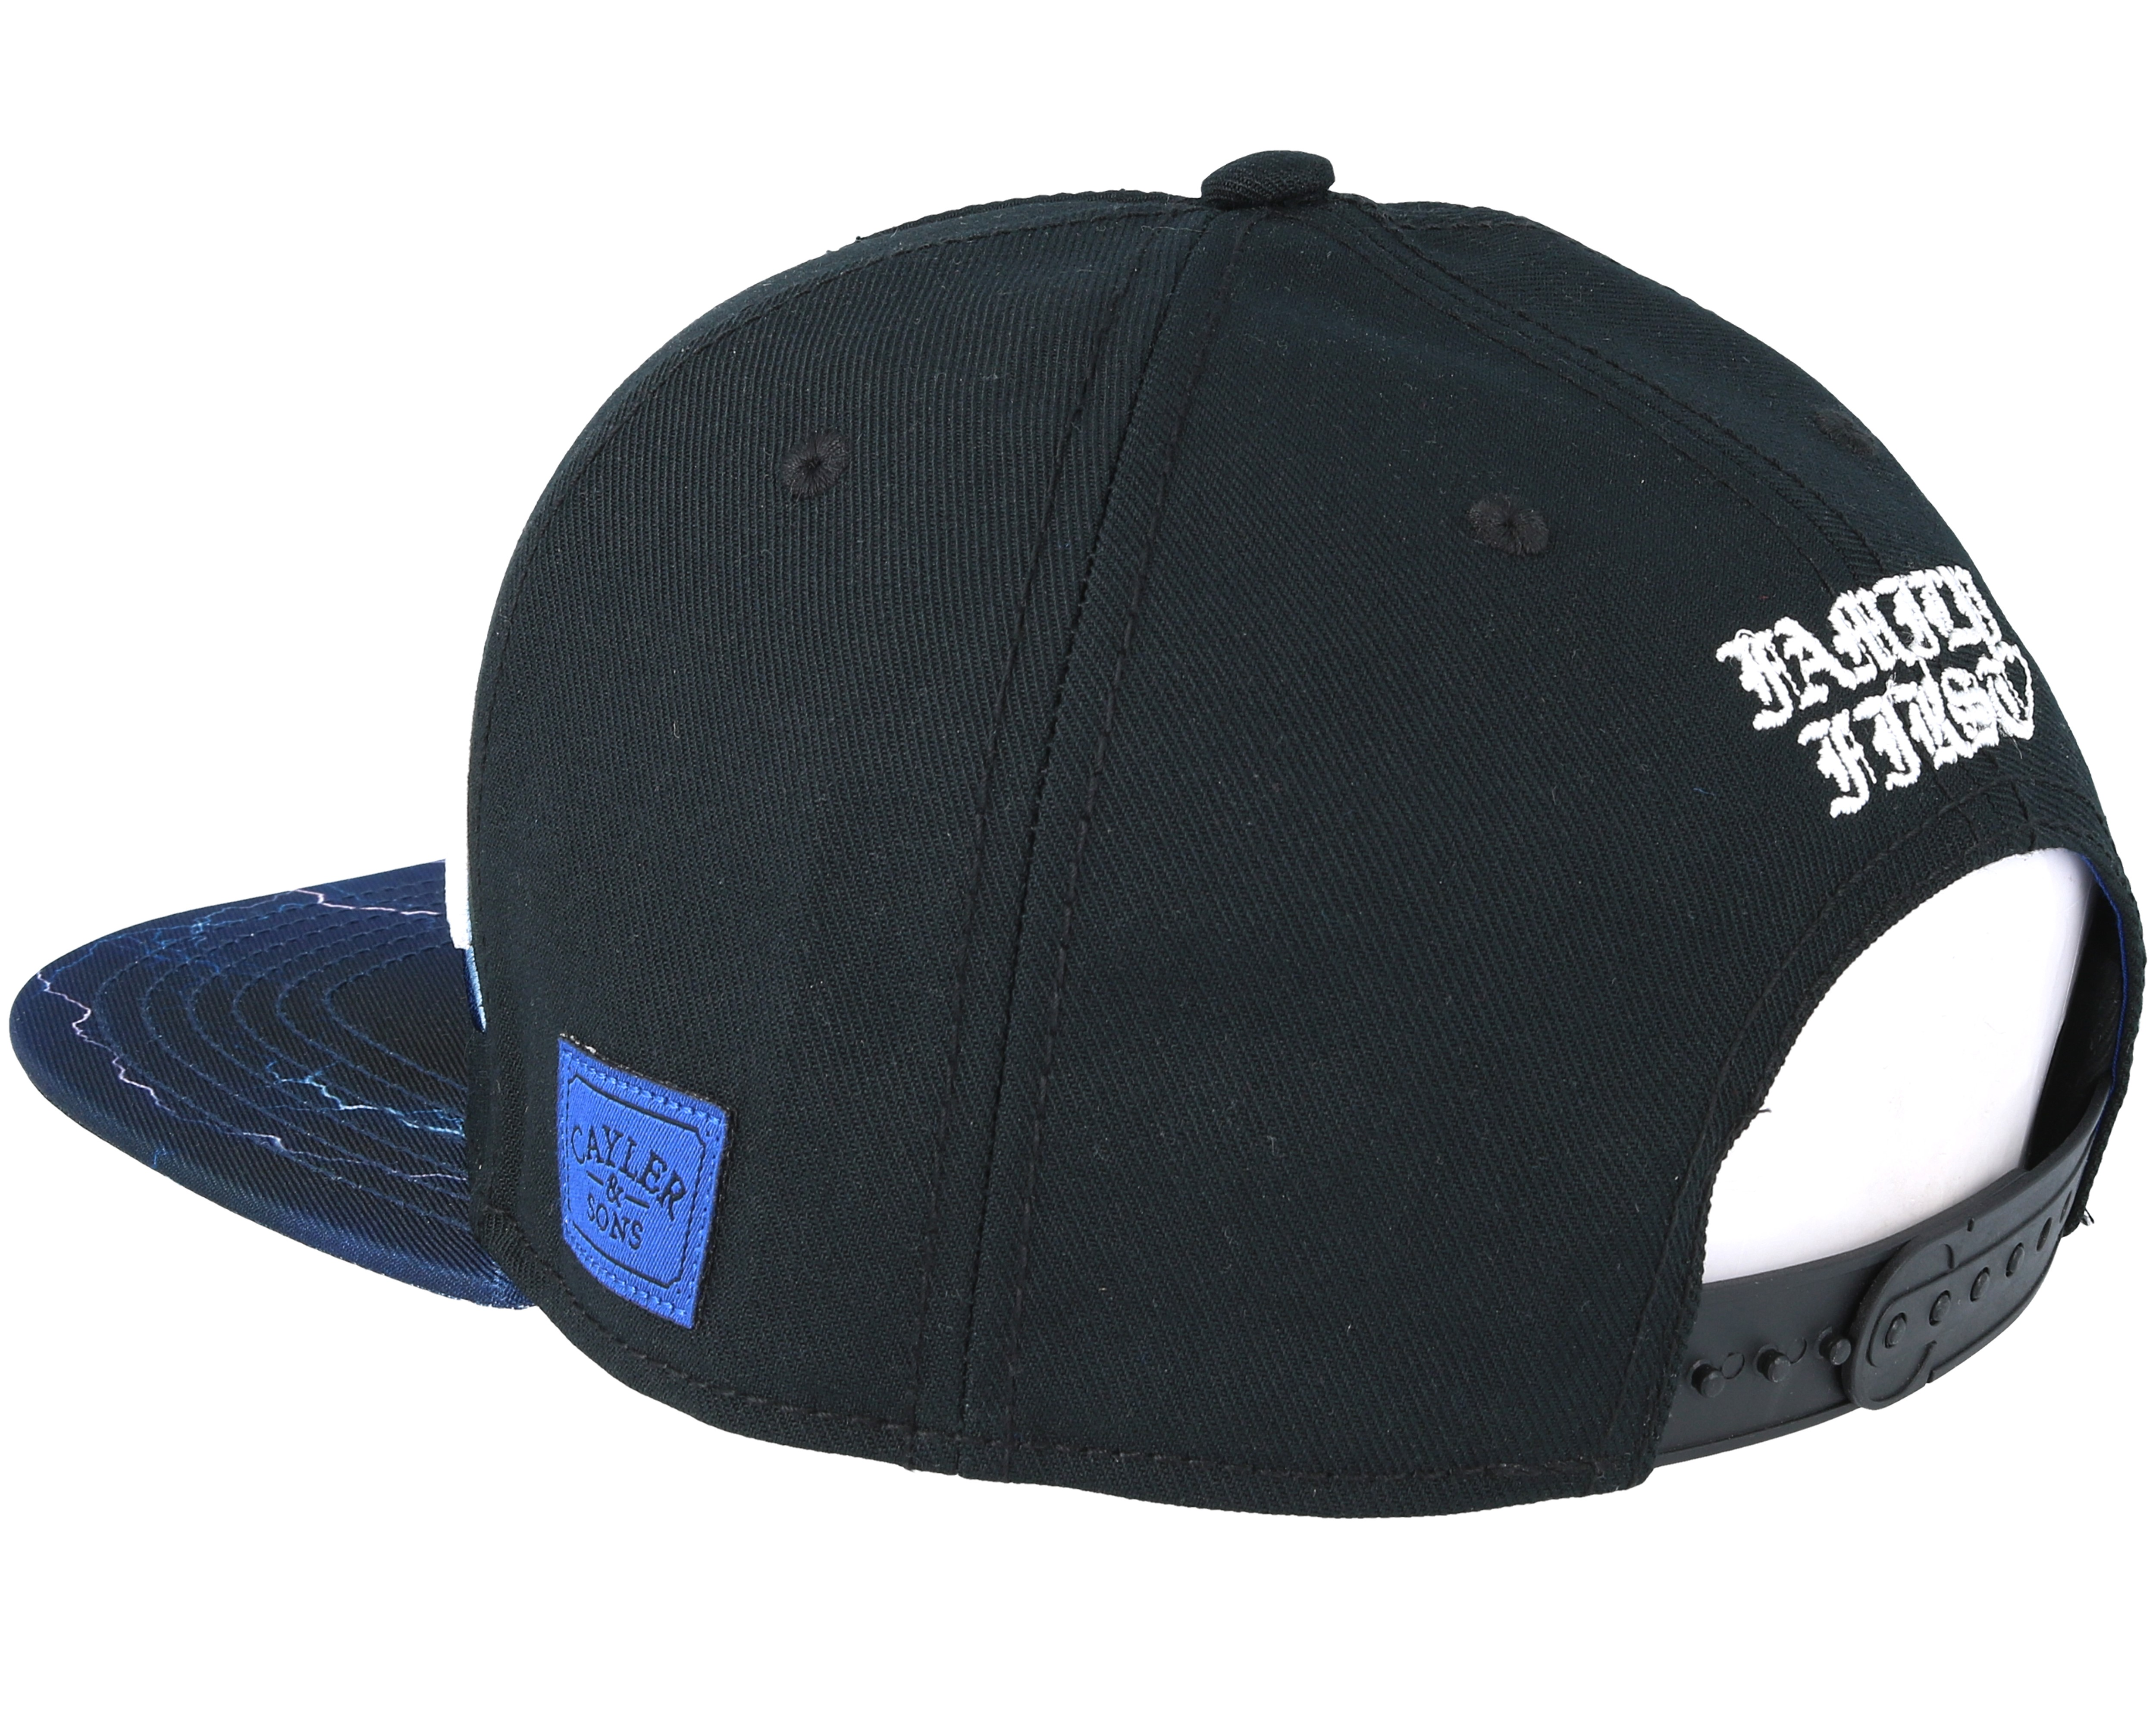 Dynarock Black Snapback - Cayler & Sons caps | Hatstore.co.uk